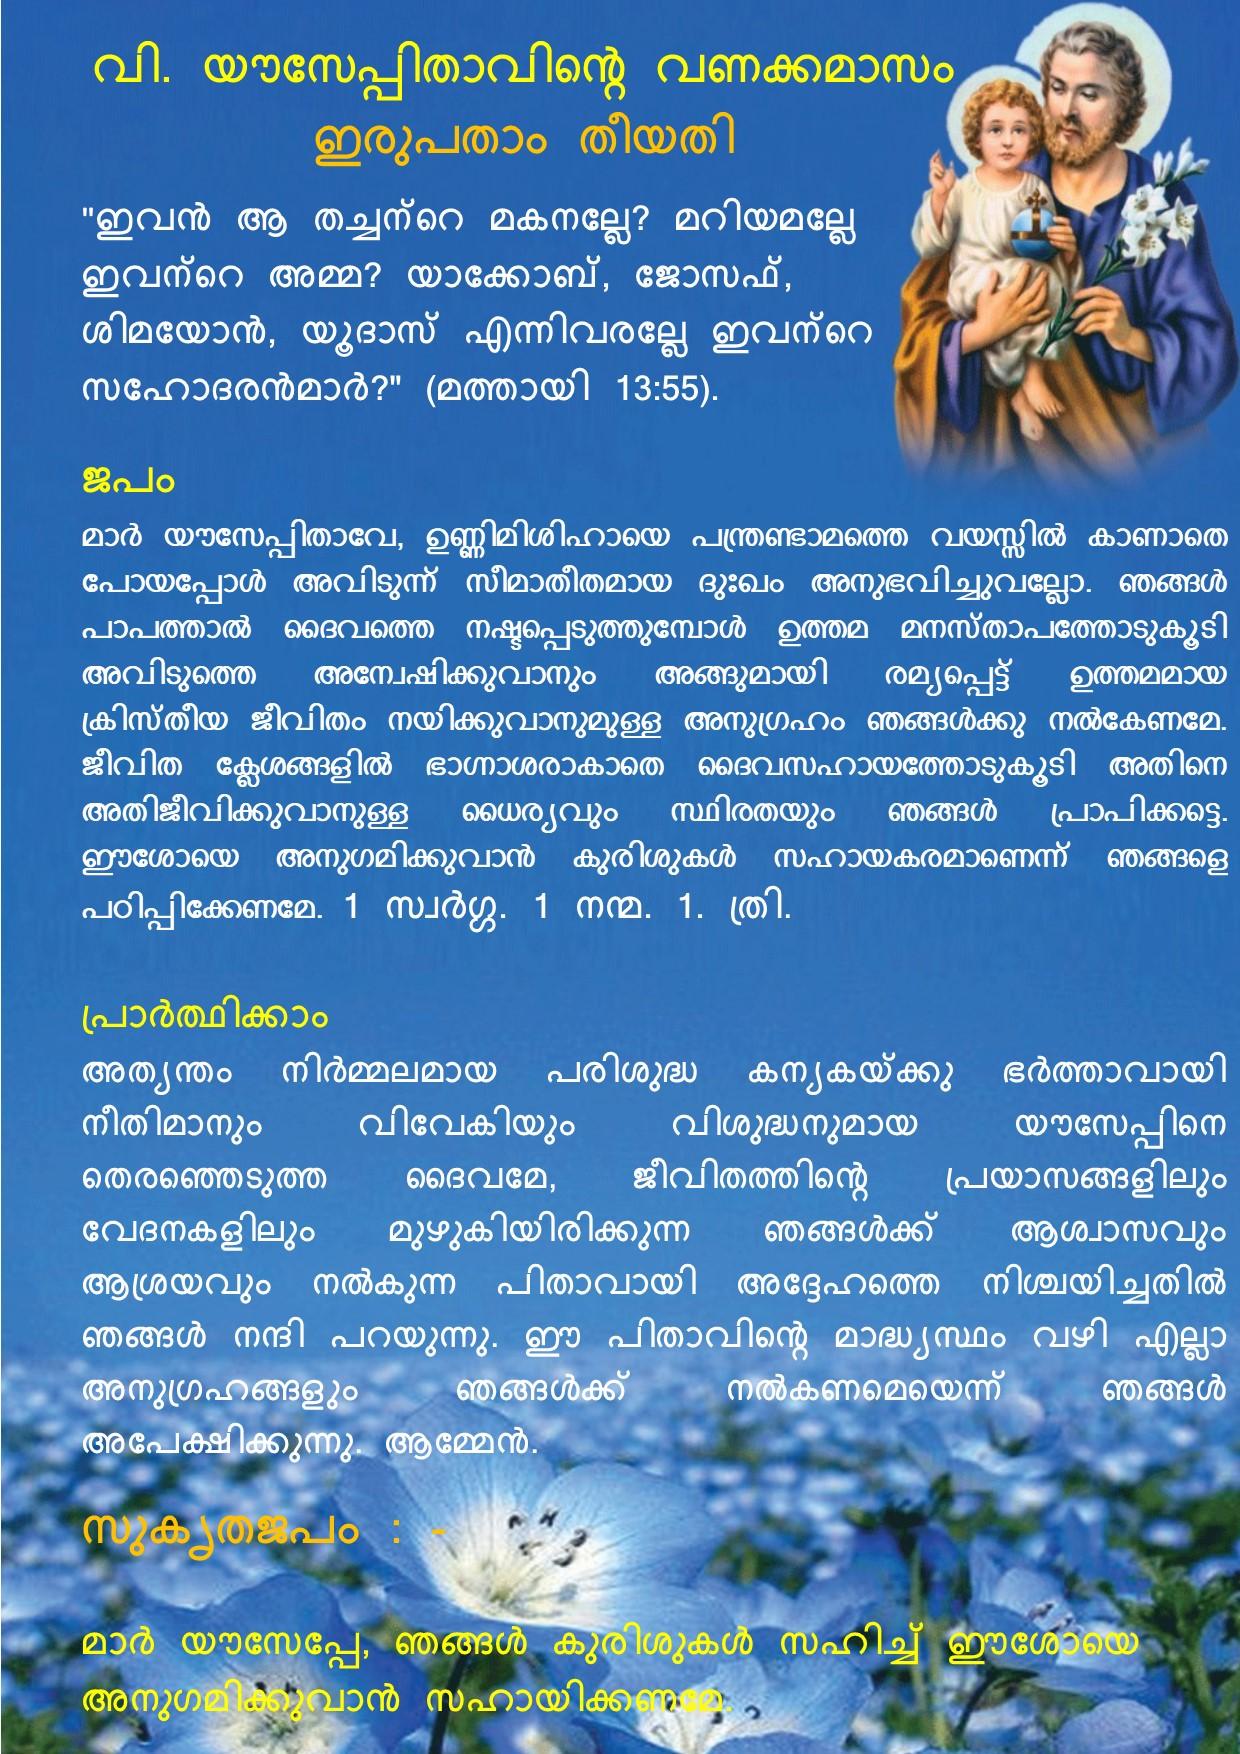 Vanakkamasam, St Joseph, March 20